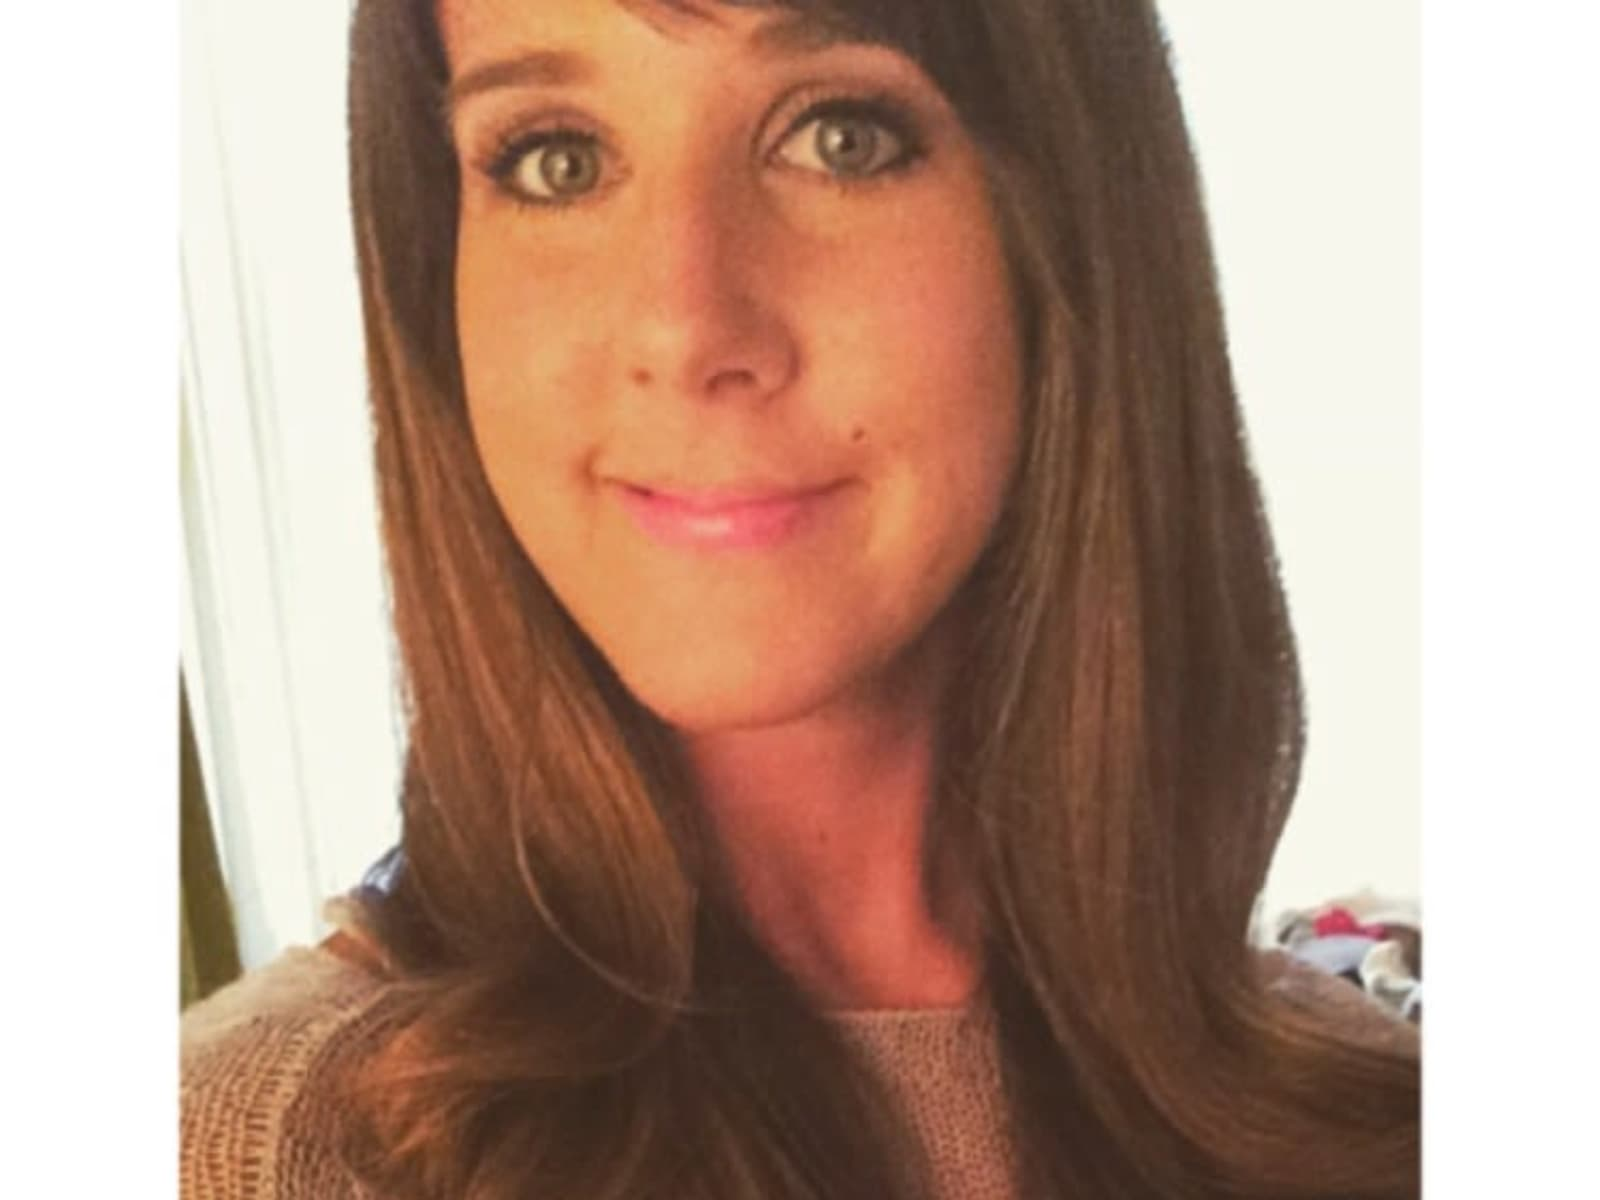 Carly from Santa Cruz, California, United States